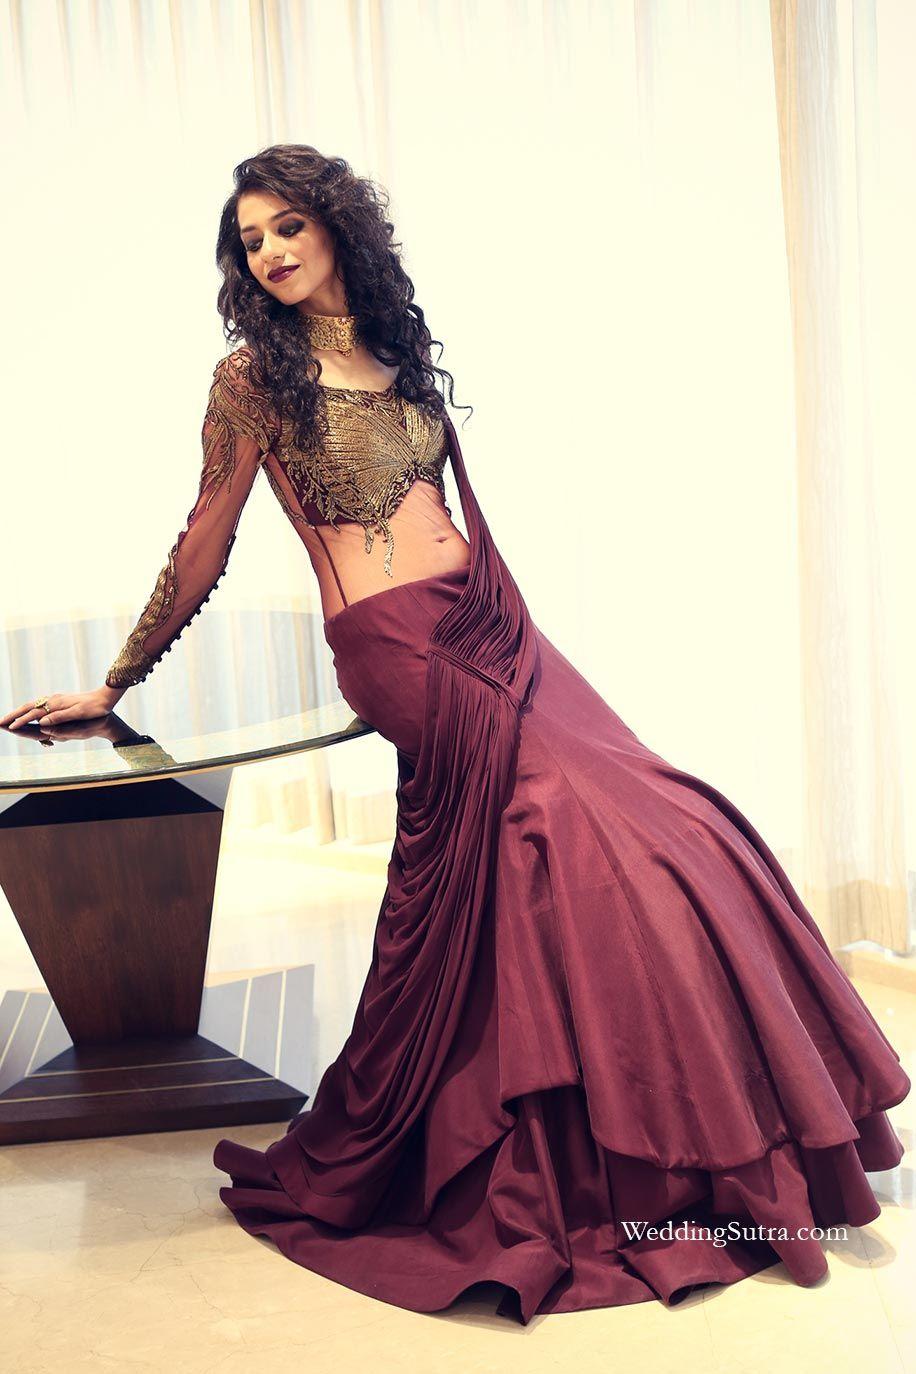 Aashumi mehta indian wear saree and indian designer wear